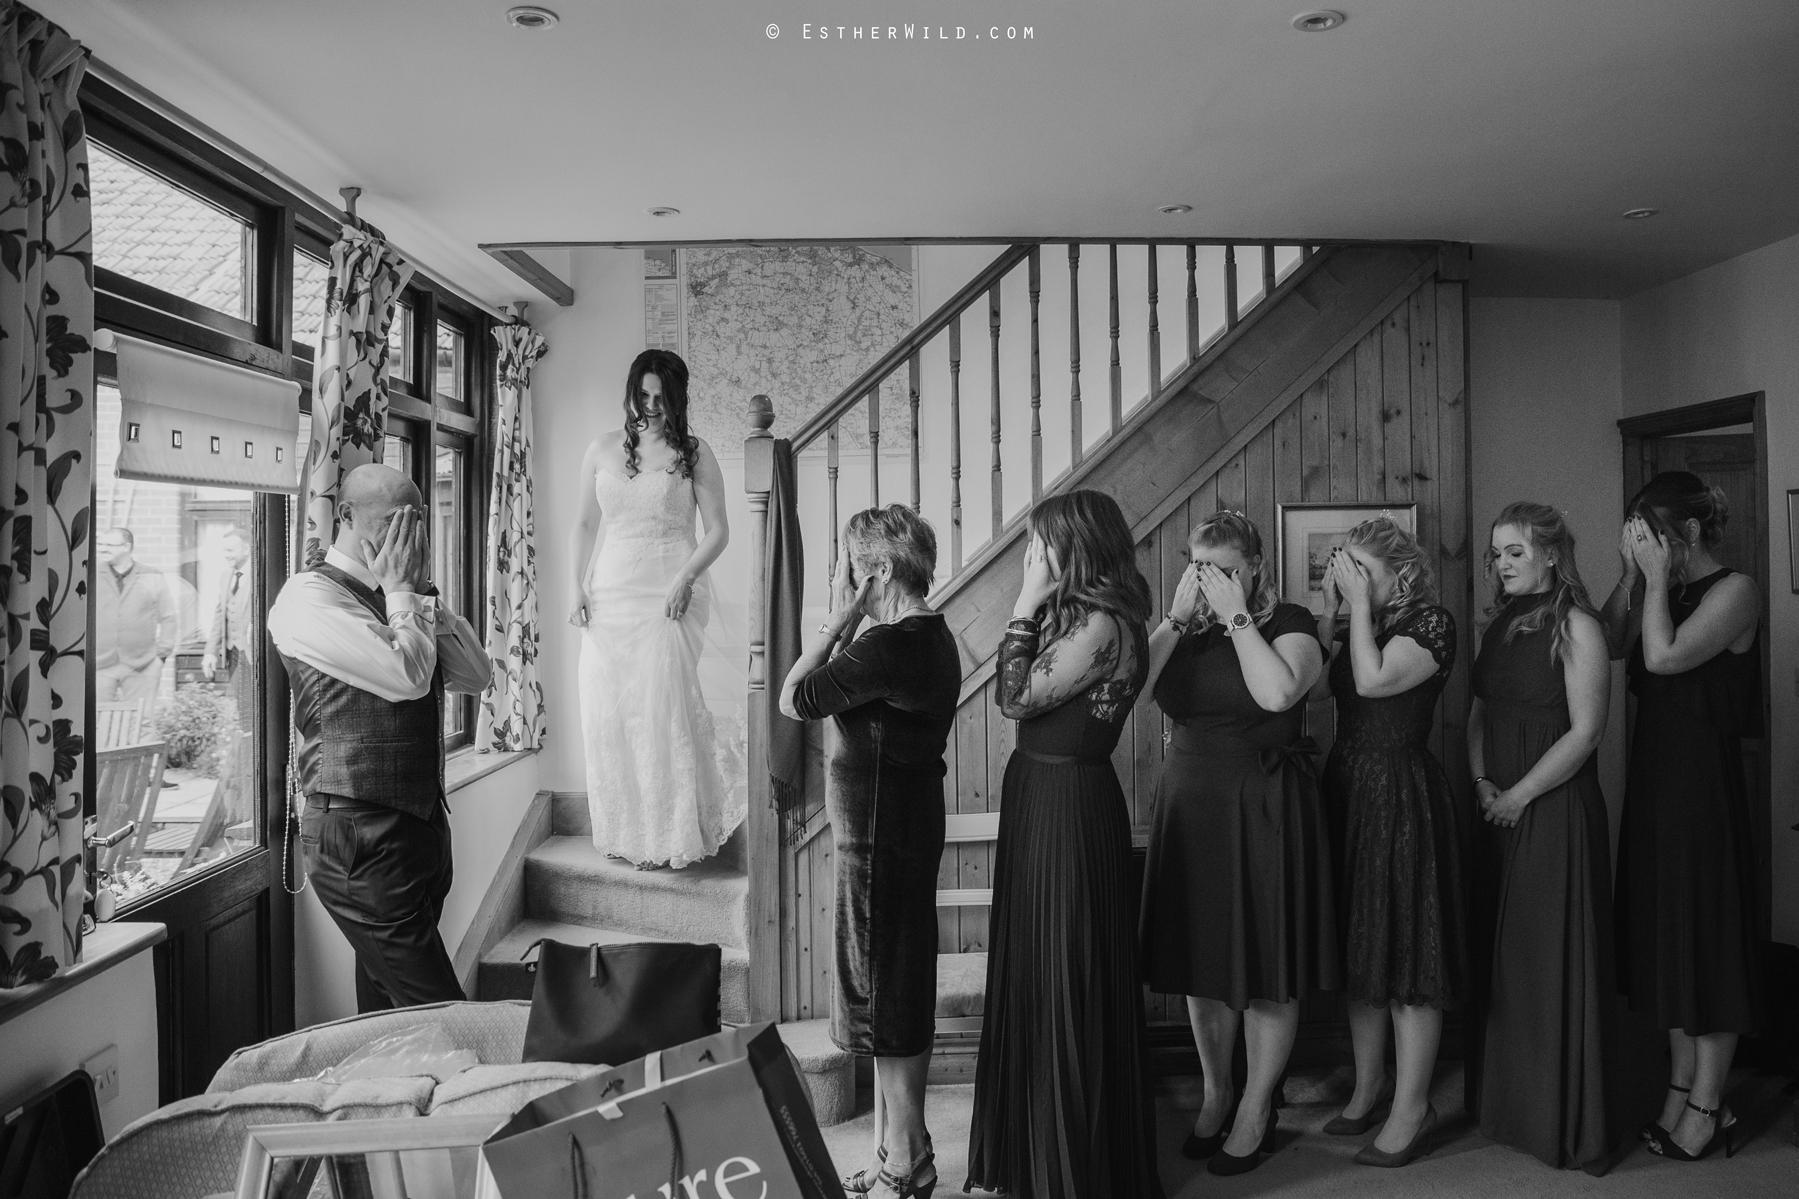 Reading_Room_Weddings_Alby_Norwich_Photographer_Esther_Wild_IMG_0533-1.jpg